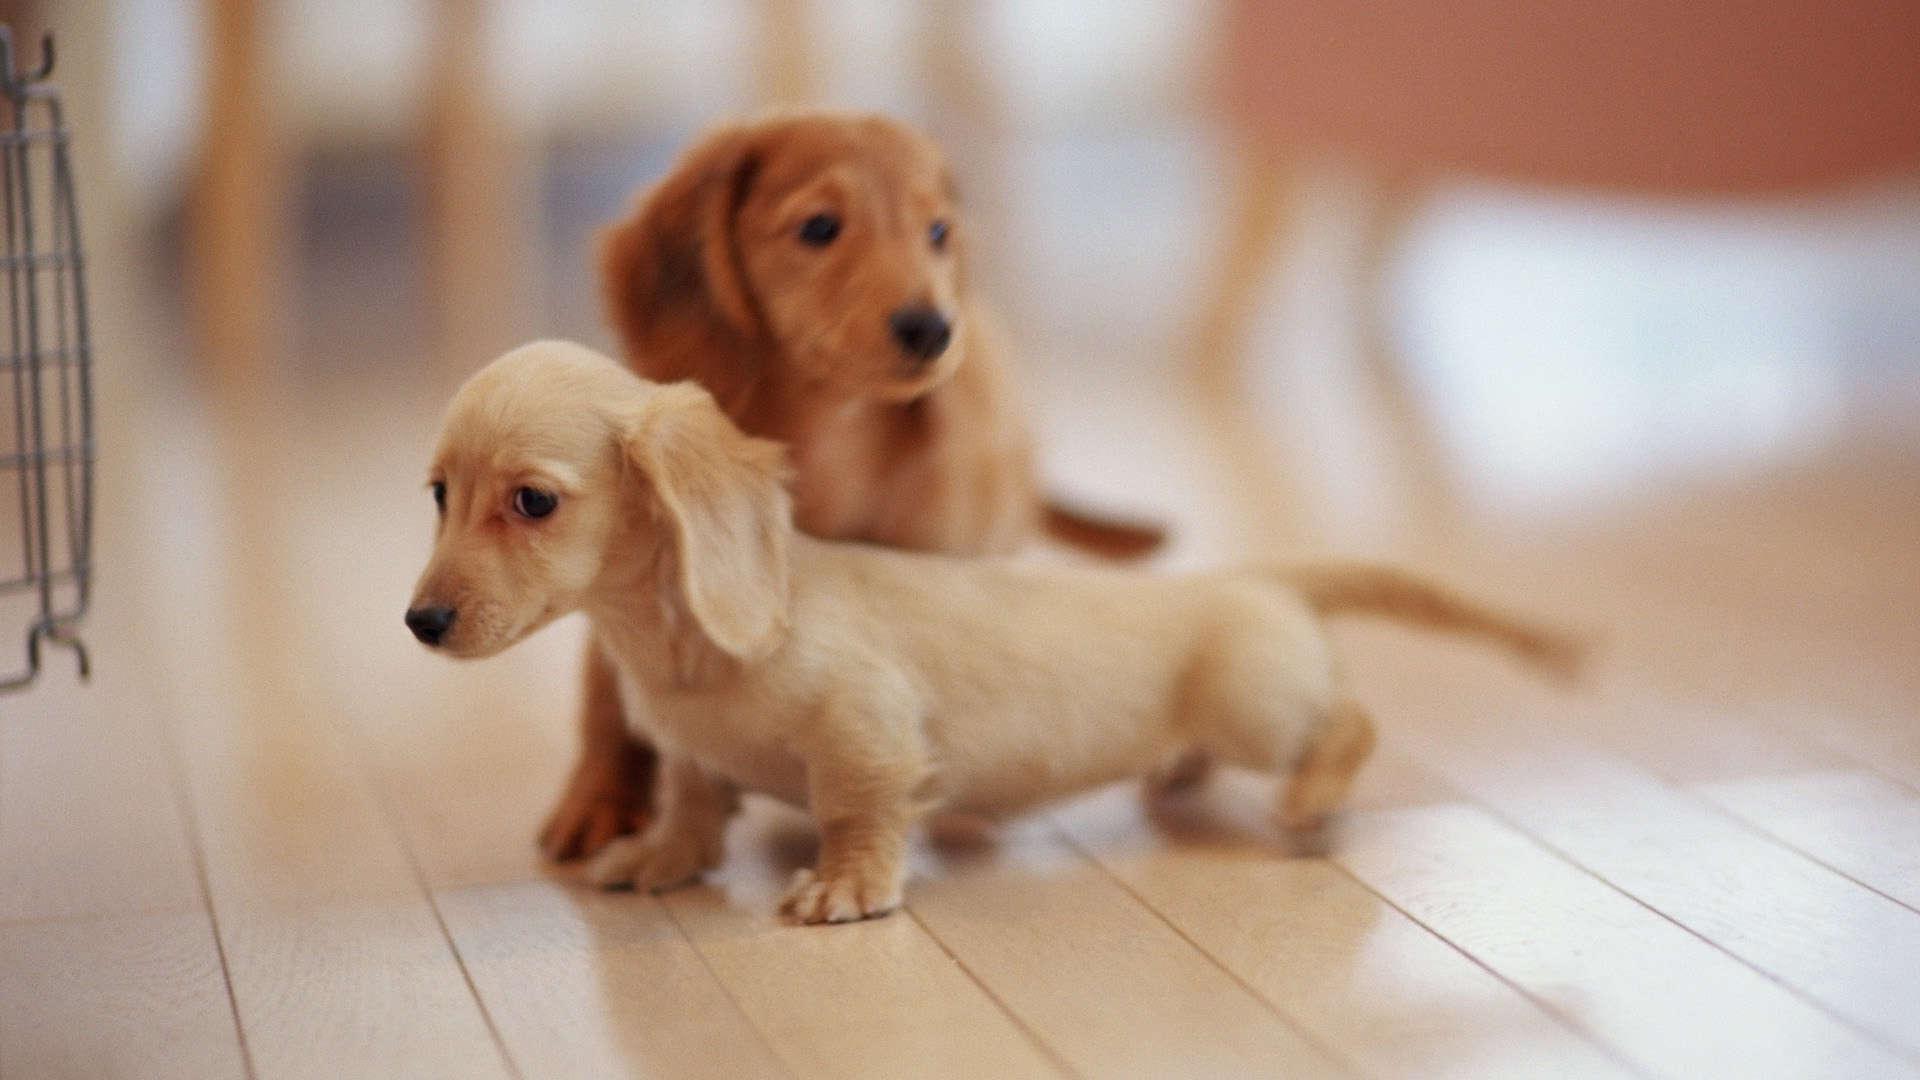 Download now: Cute HD Dachshund Puppies Wallpaper. Read description ...